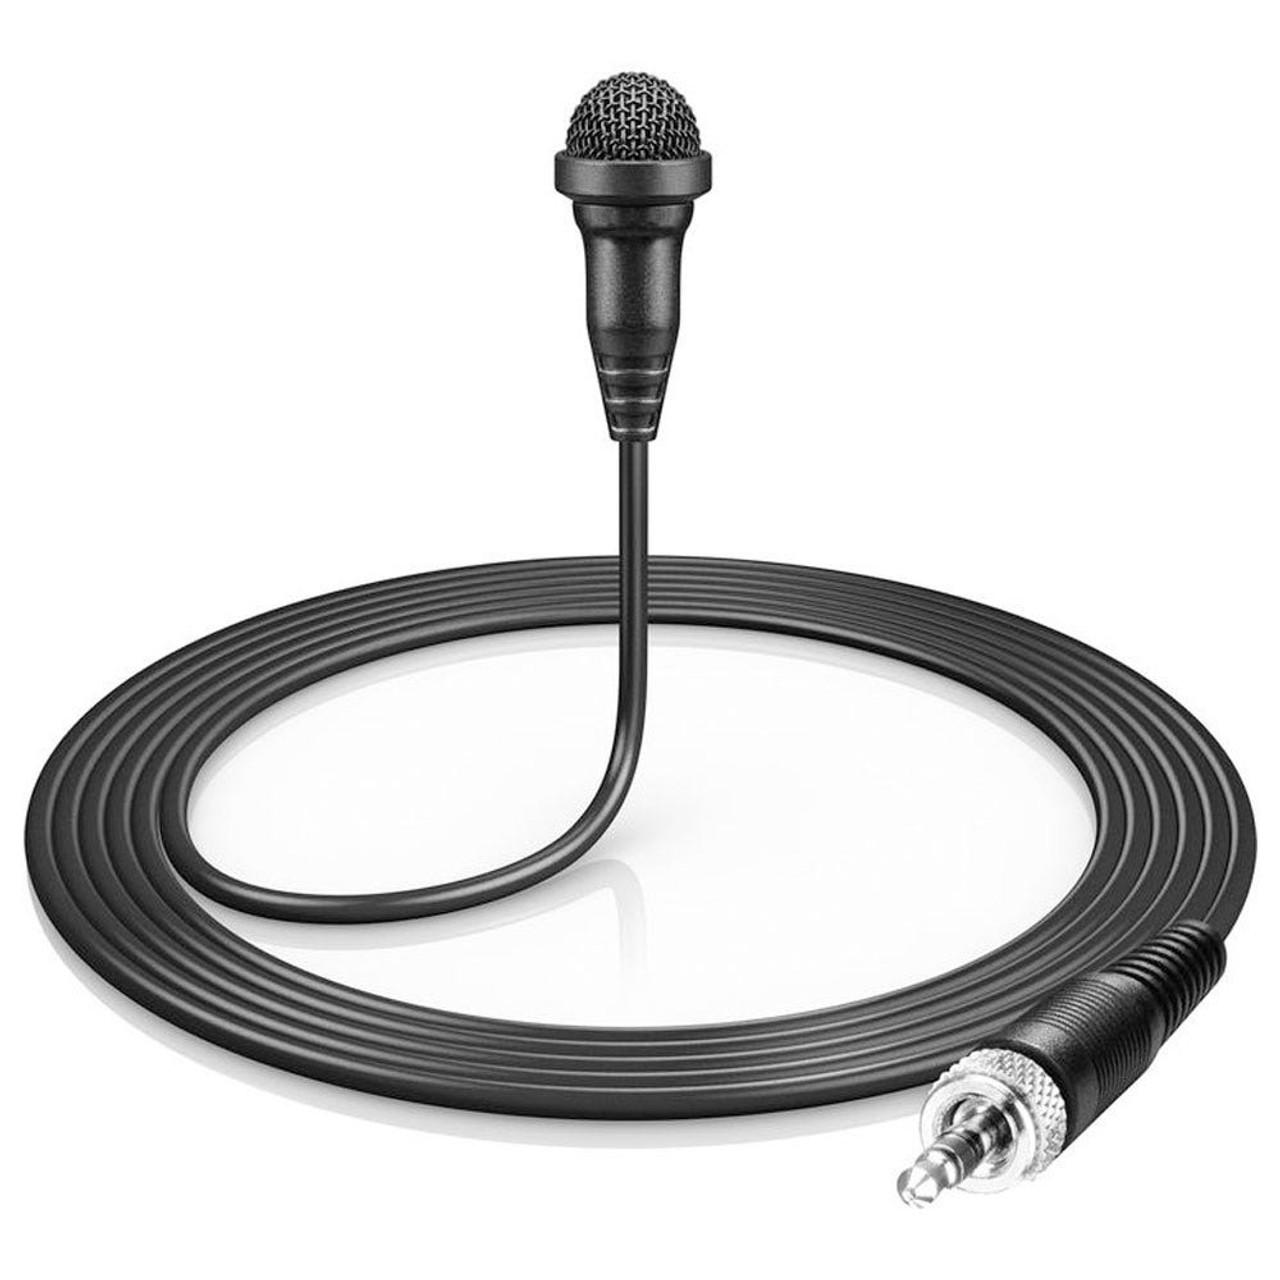 Sennheiser XSW1-ME2 Wireless Lavalier Microphone System